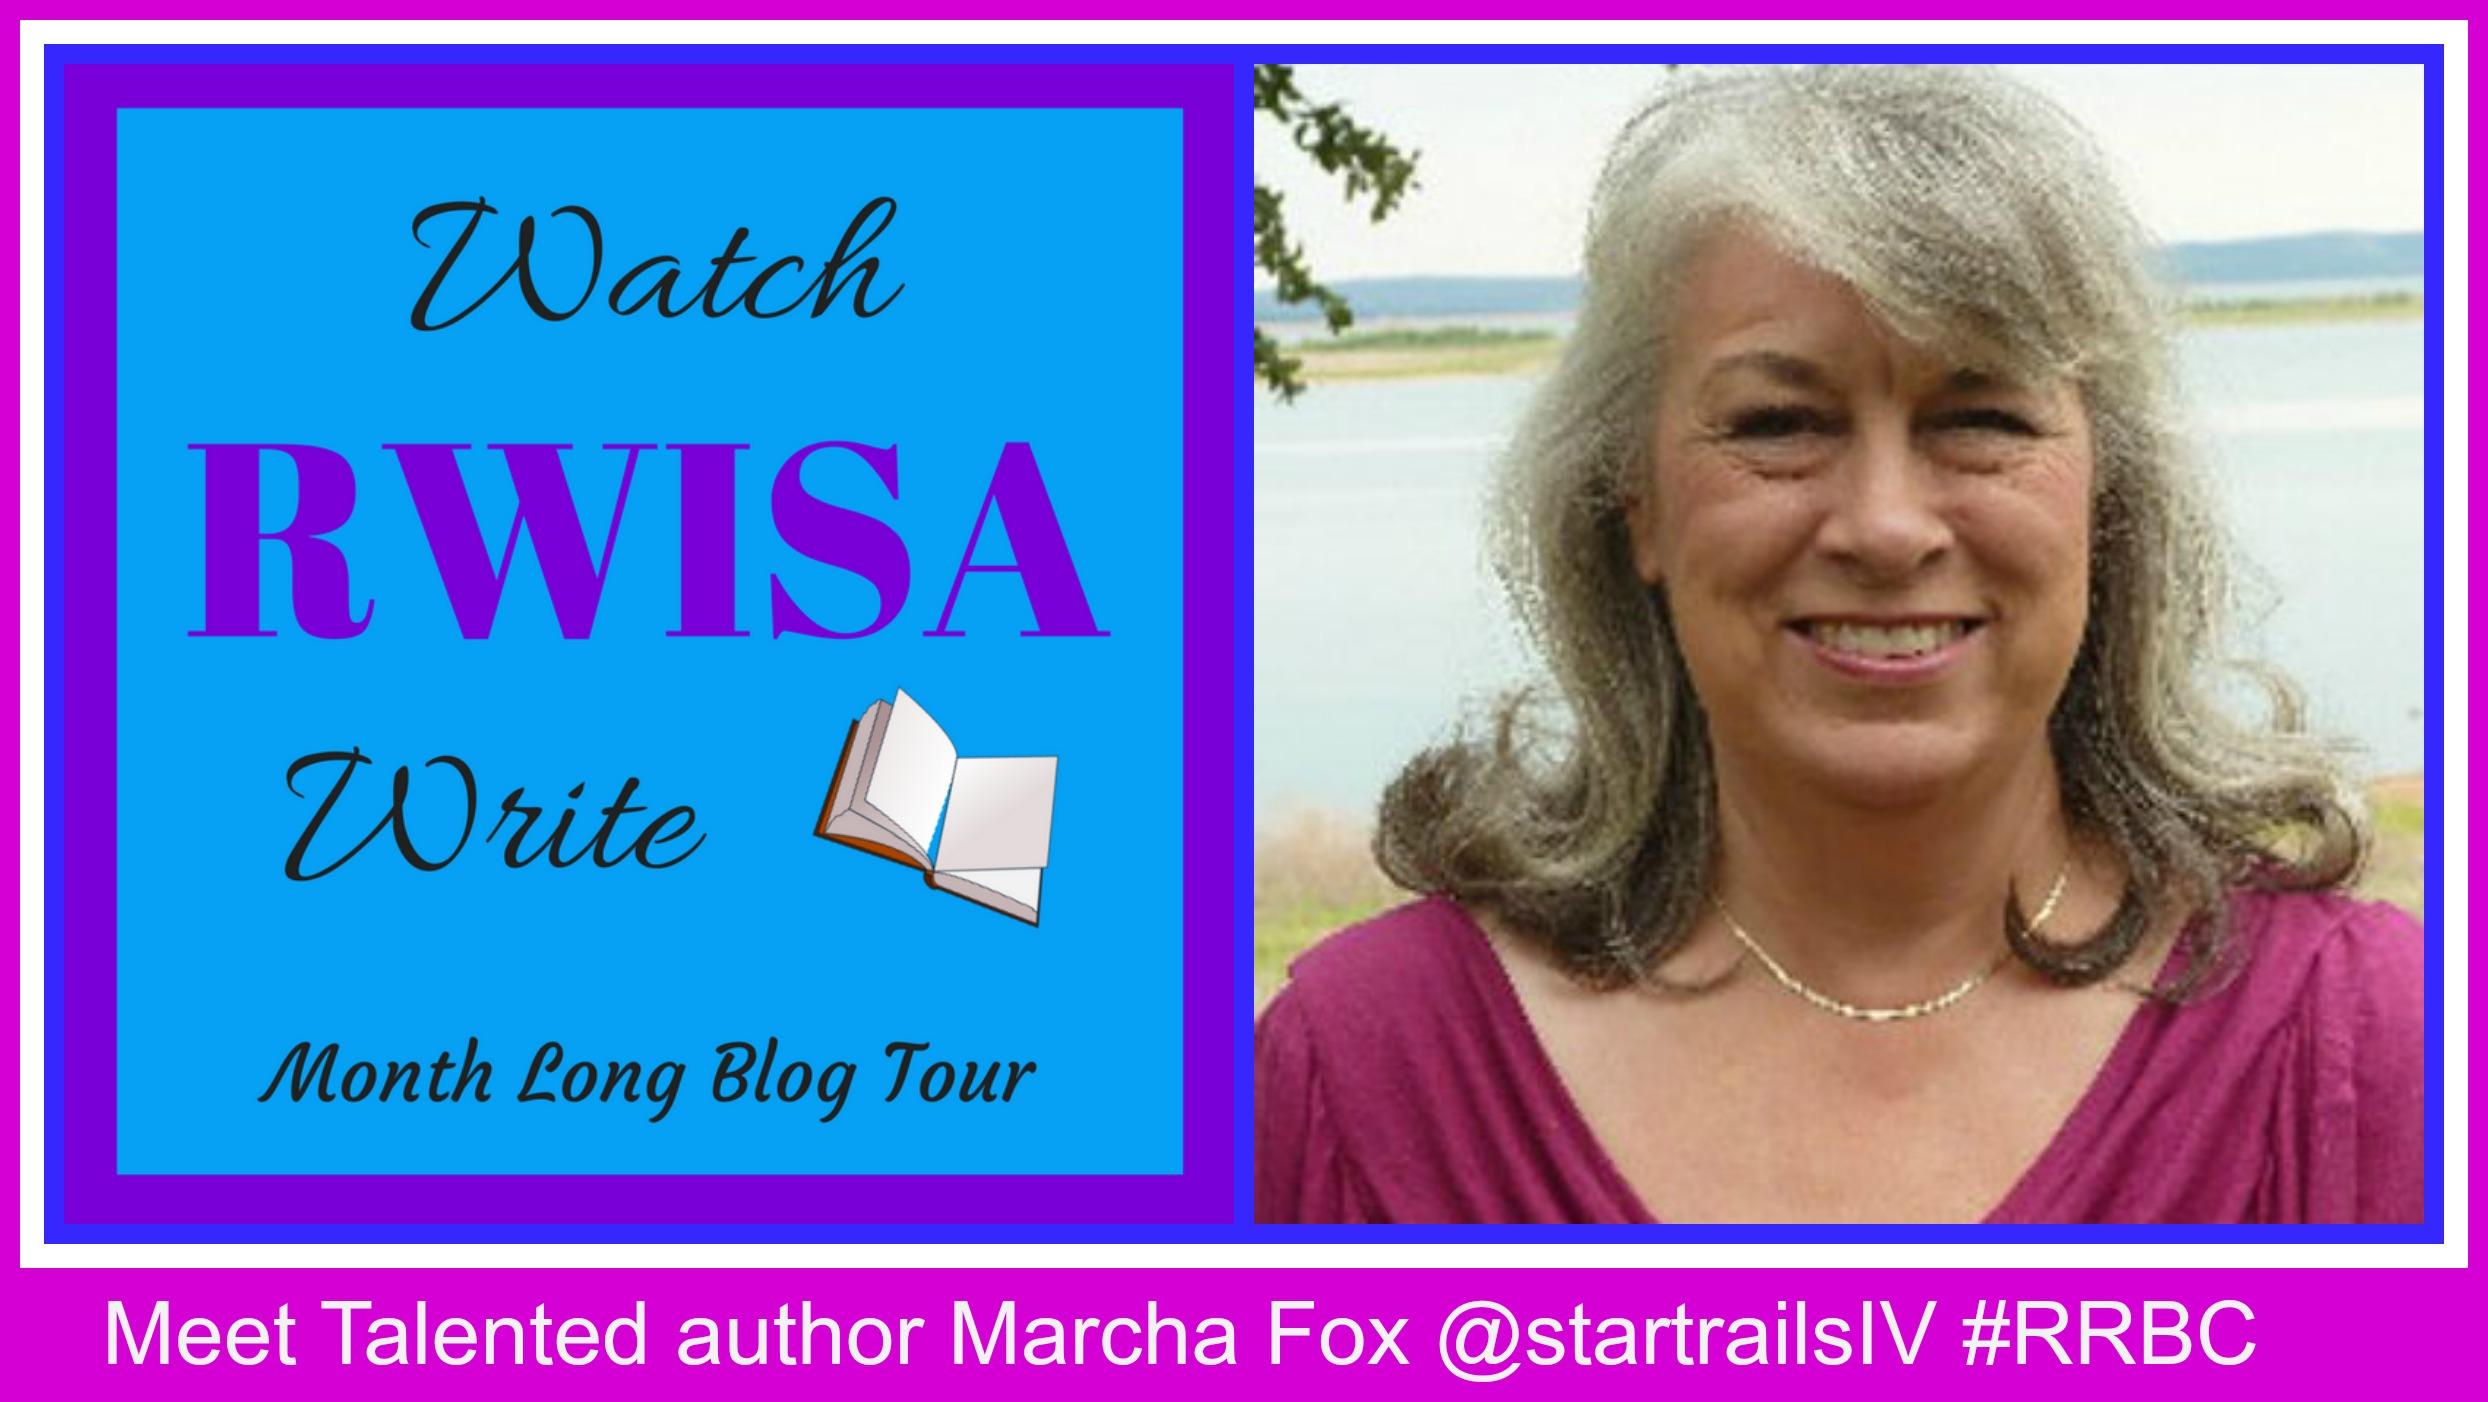 RWISA MARCHA FOX TOUR